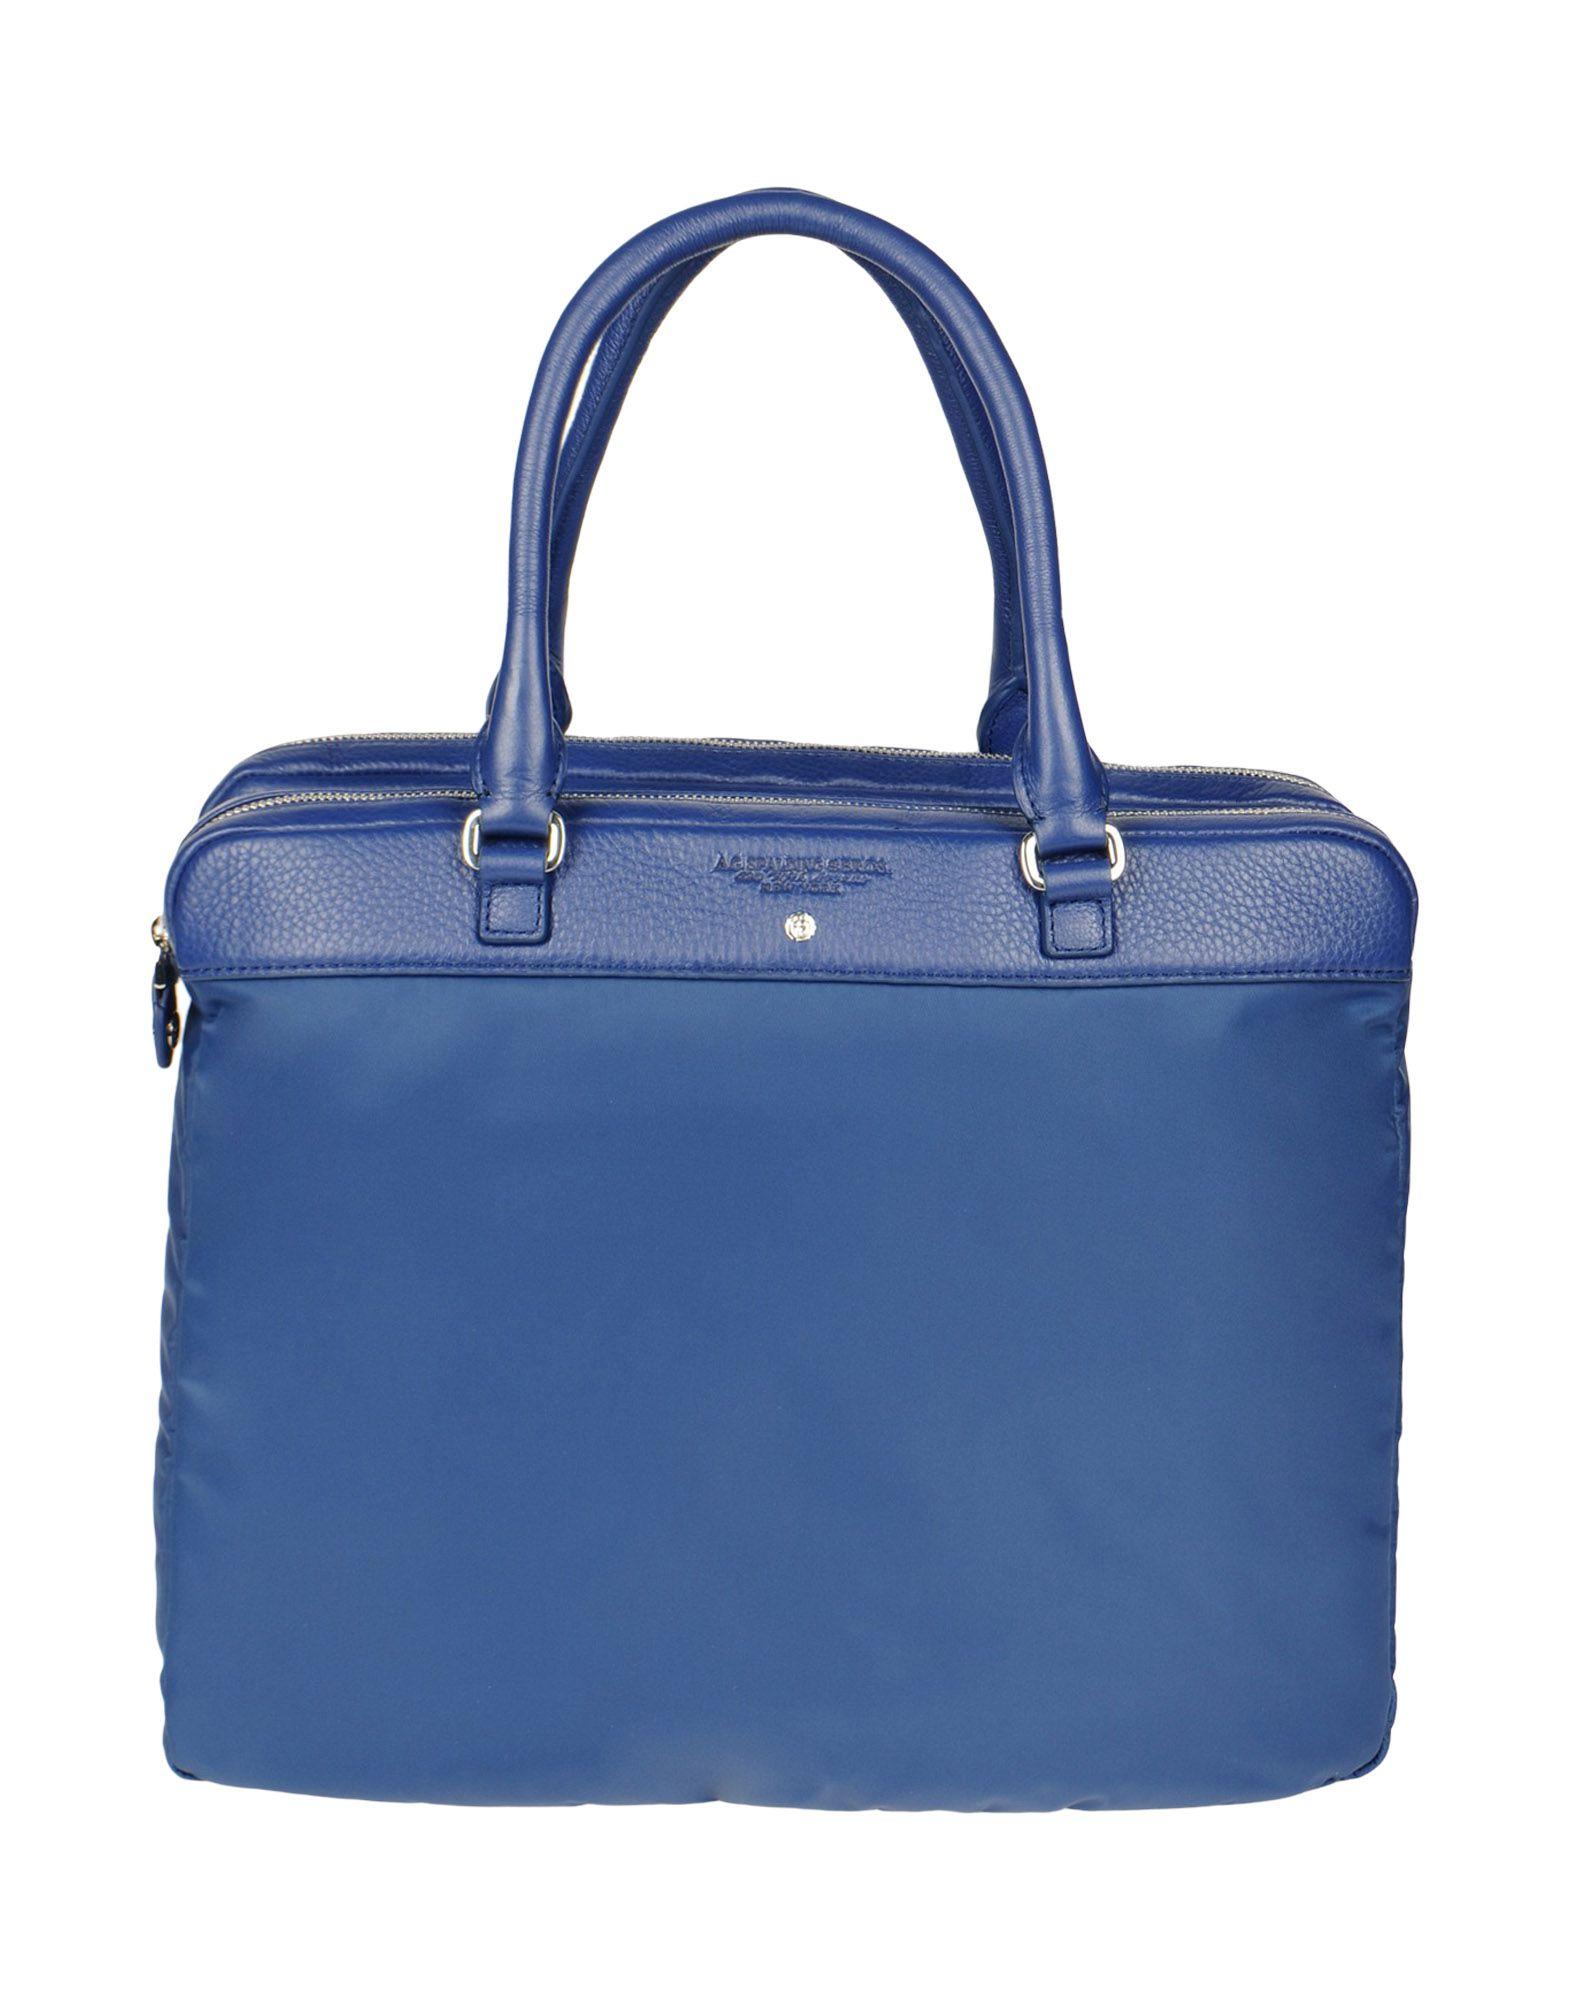 A.G. SPALDING & BROS. 520 FIFTH AVENUE New York Деловые сумки декор blau fifth avenue dec tyffanny a 25x75